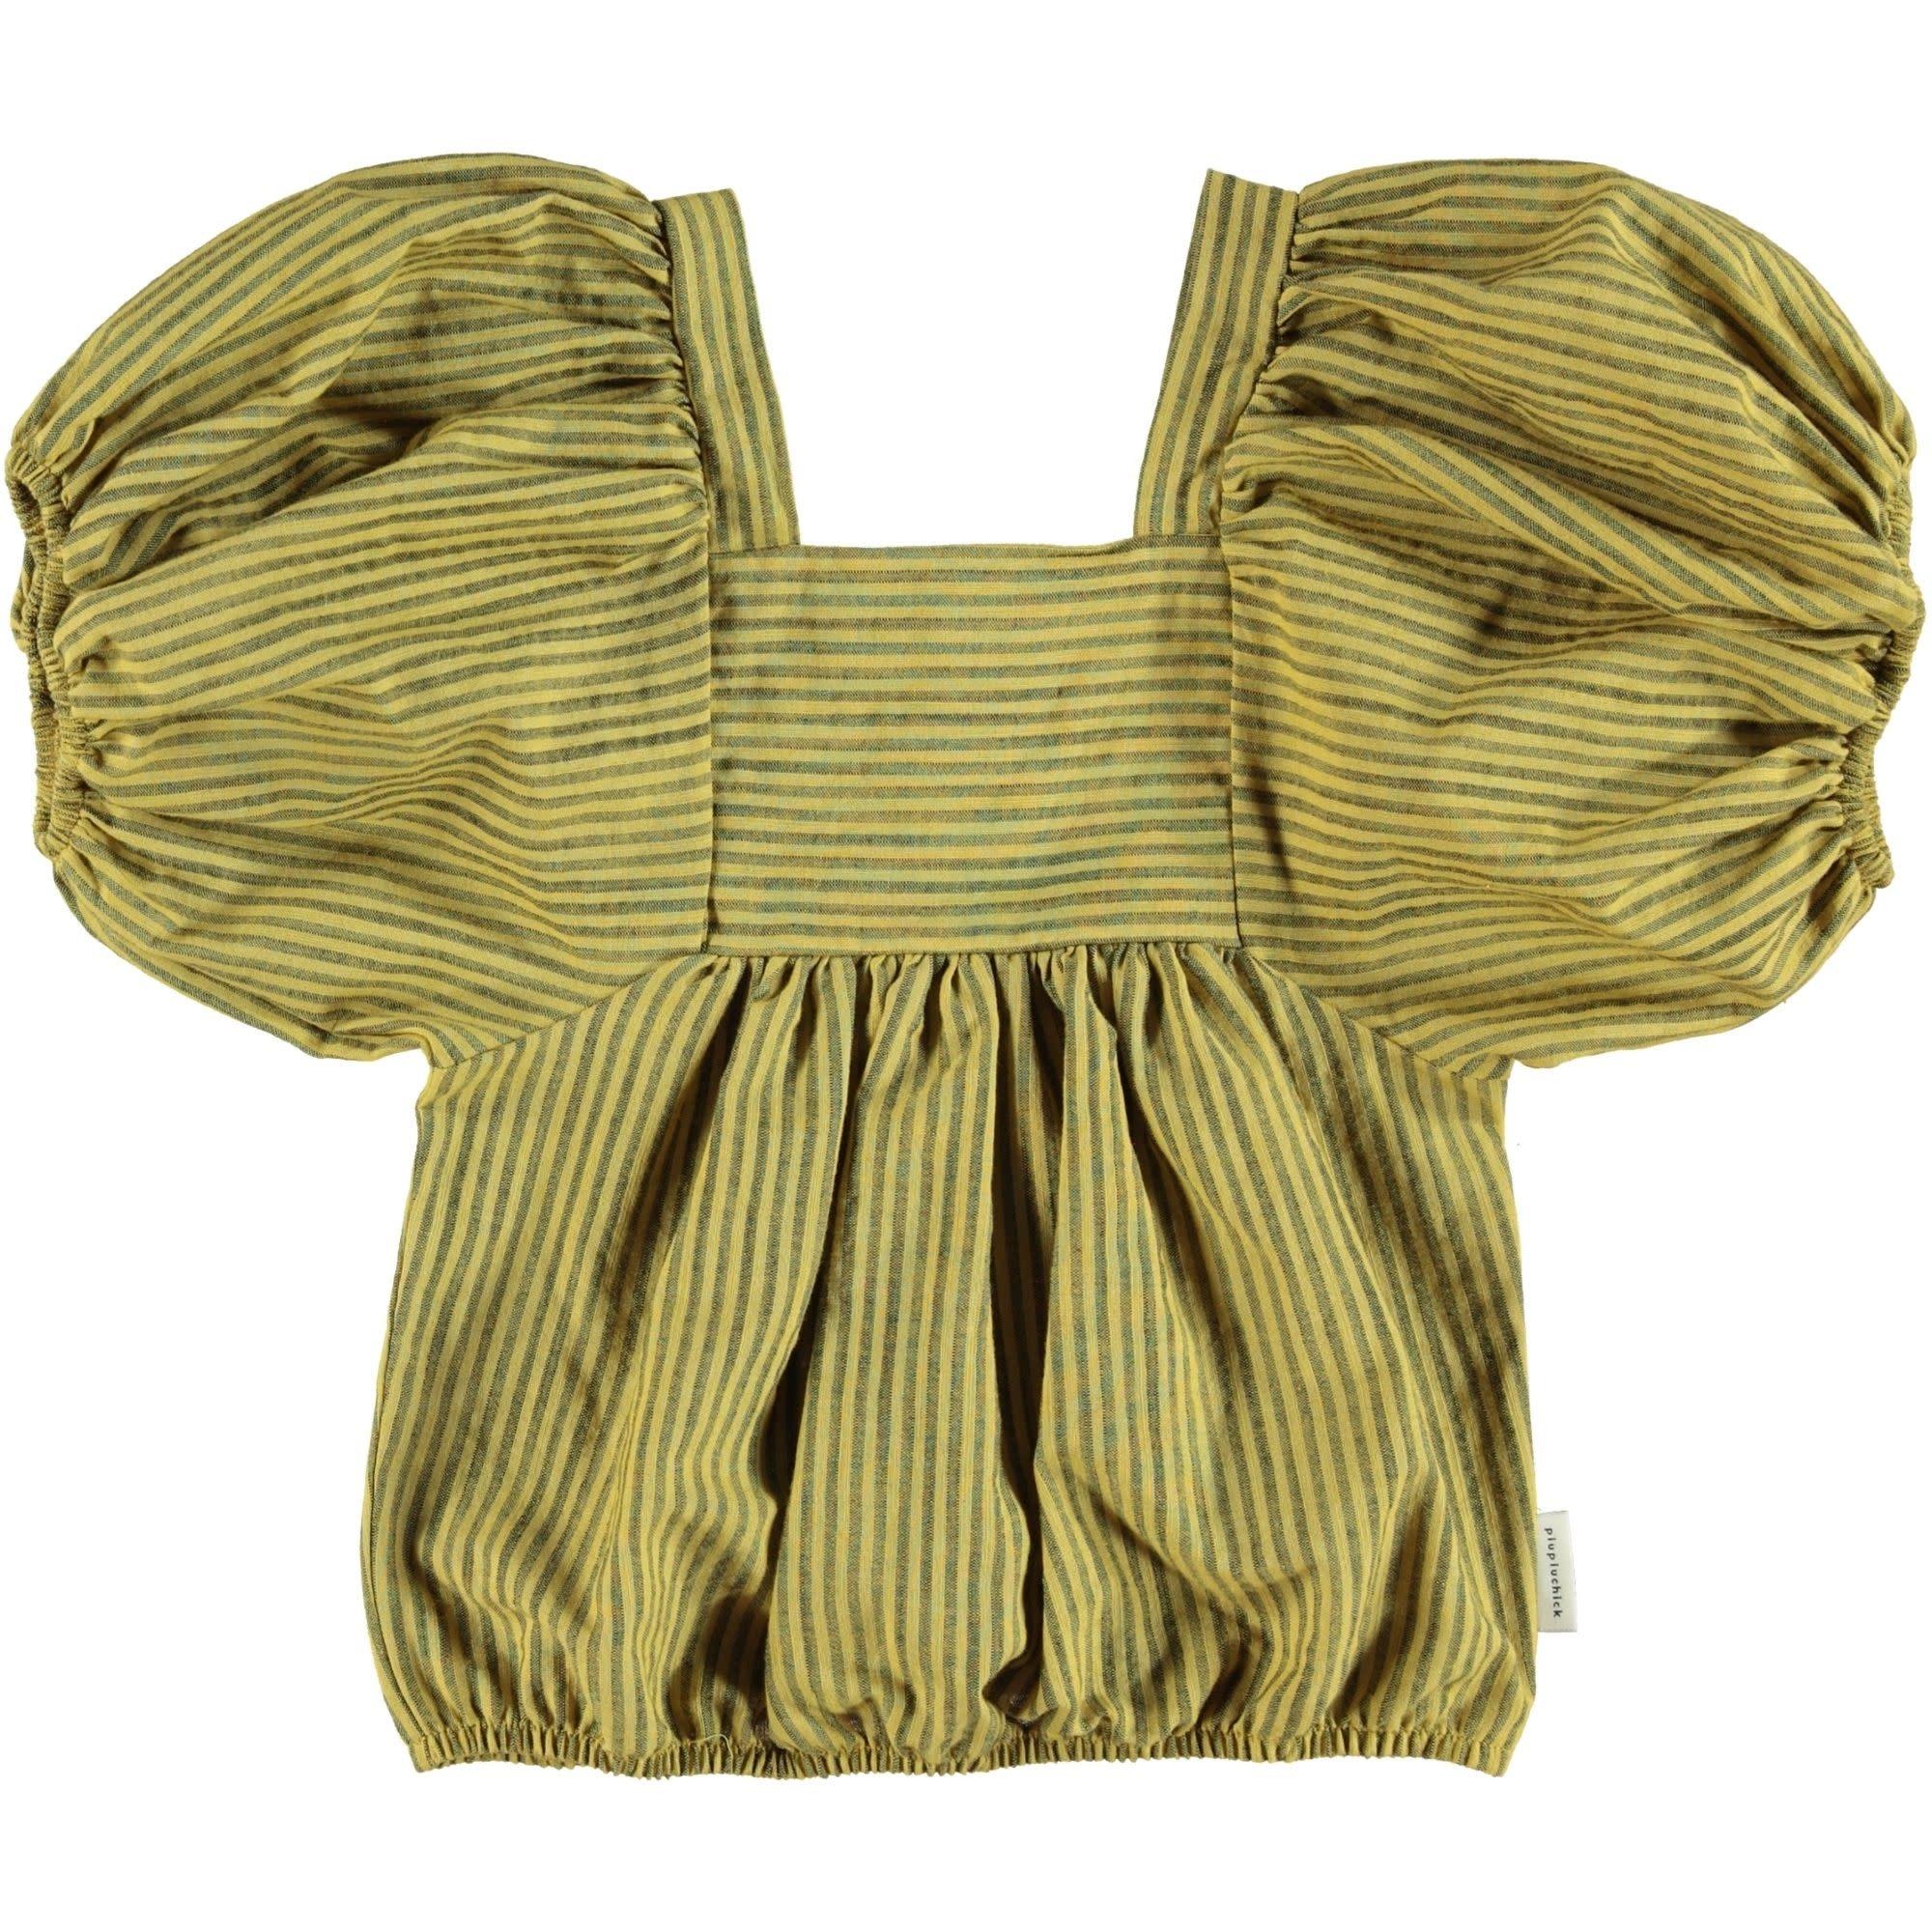 Piupiuchick Piupiuchick - Top ballon sleeves yellow with grey stripes